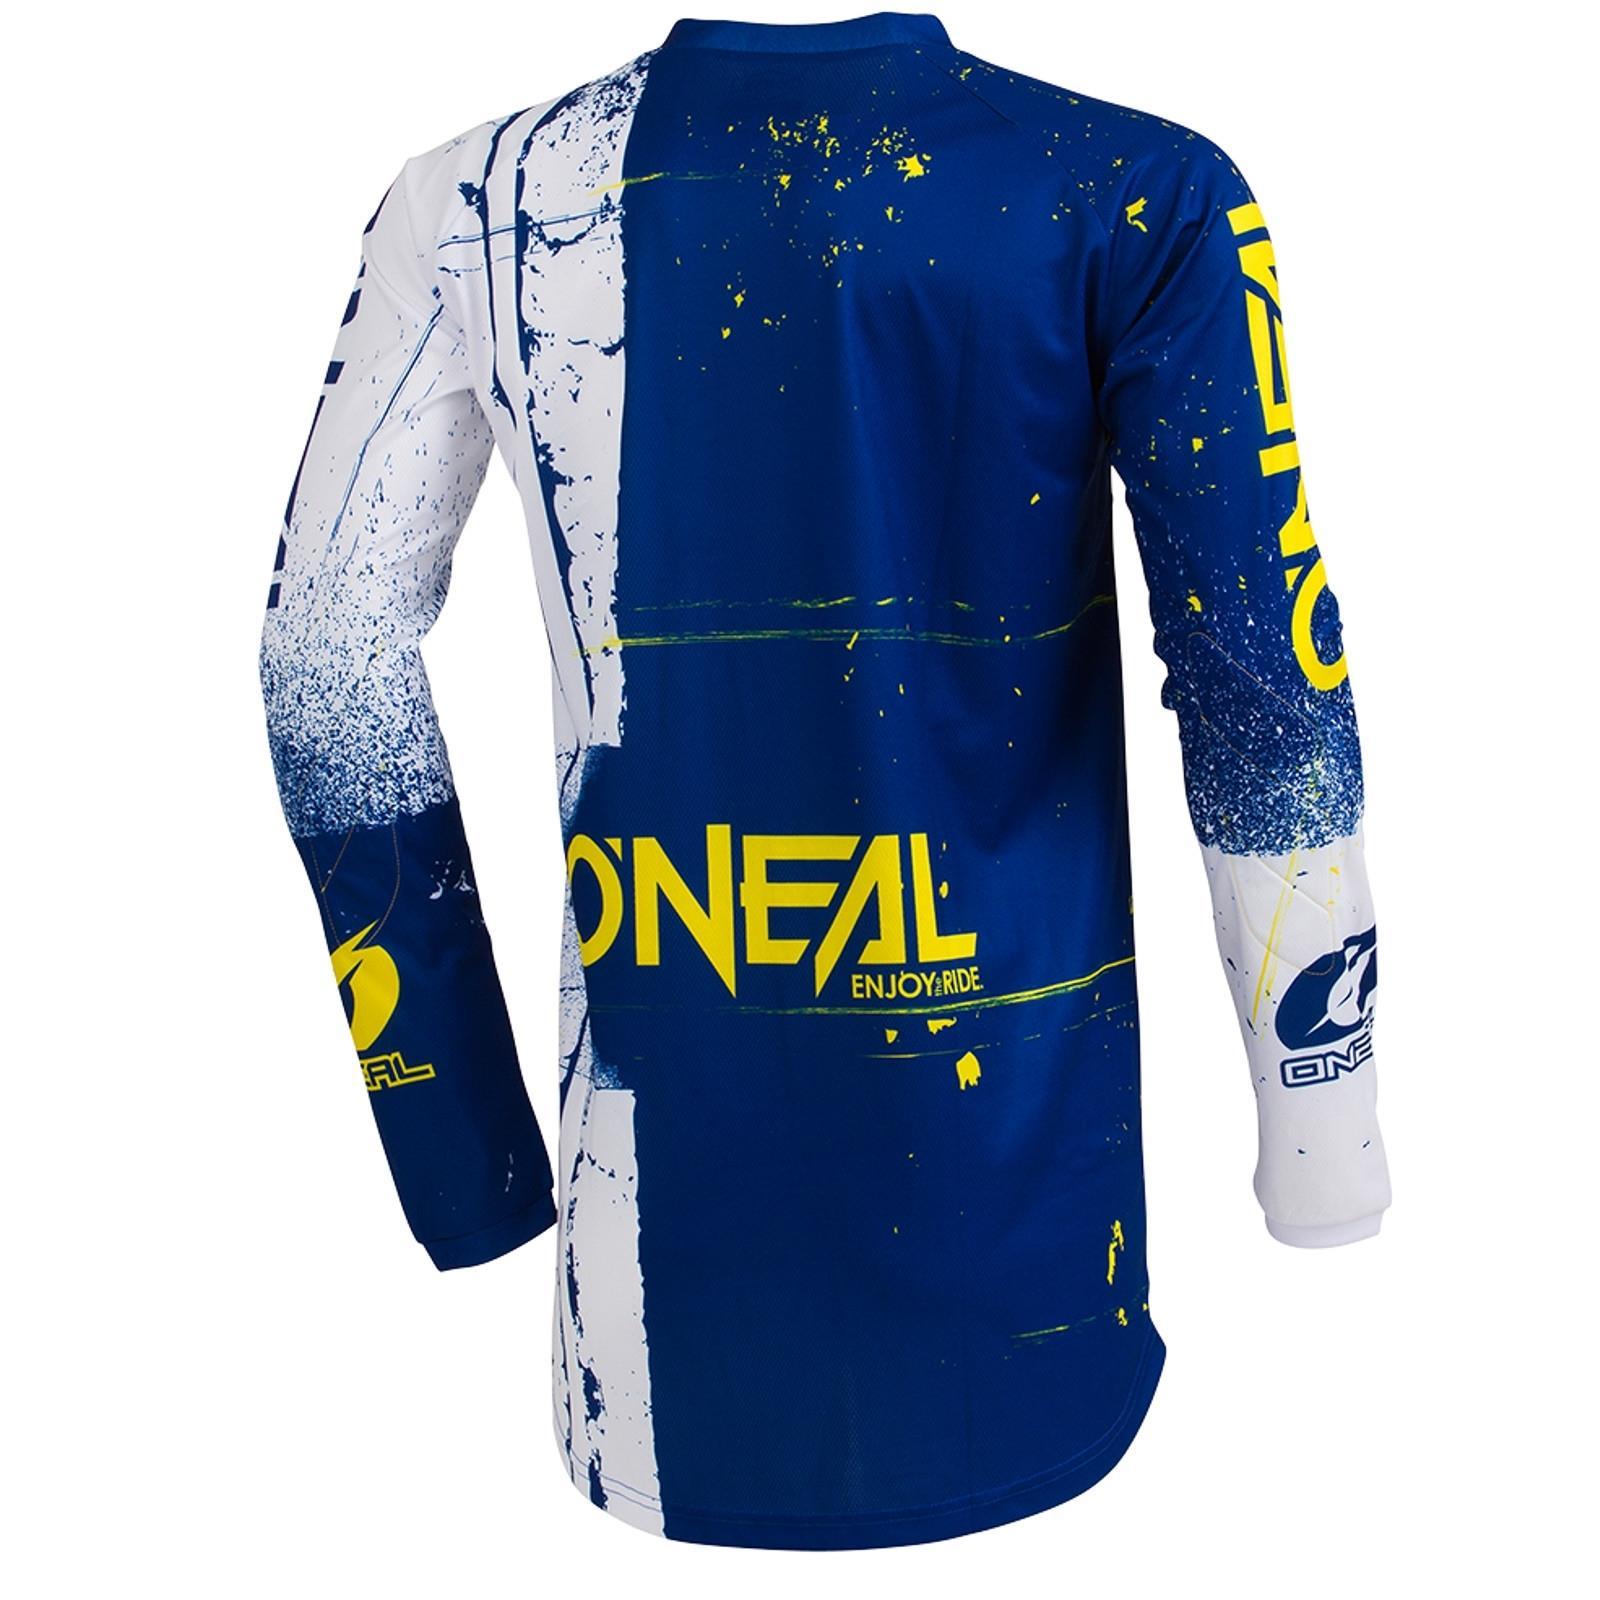 O-039-Neal-elemento-Mayhem-JERSEY-Racewear-Motocross-Maglia-MX-DH-FR-MTB-MOUNTAIN-BIKE miniatura 32